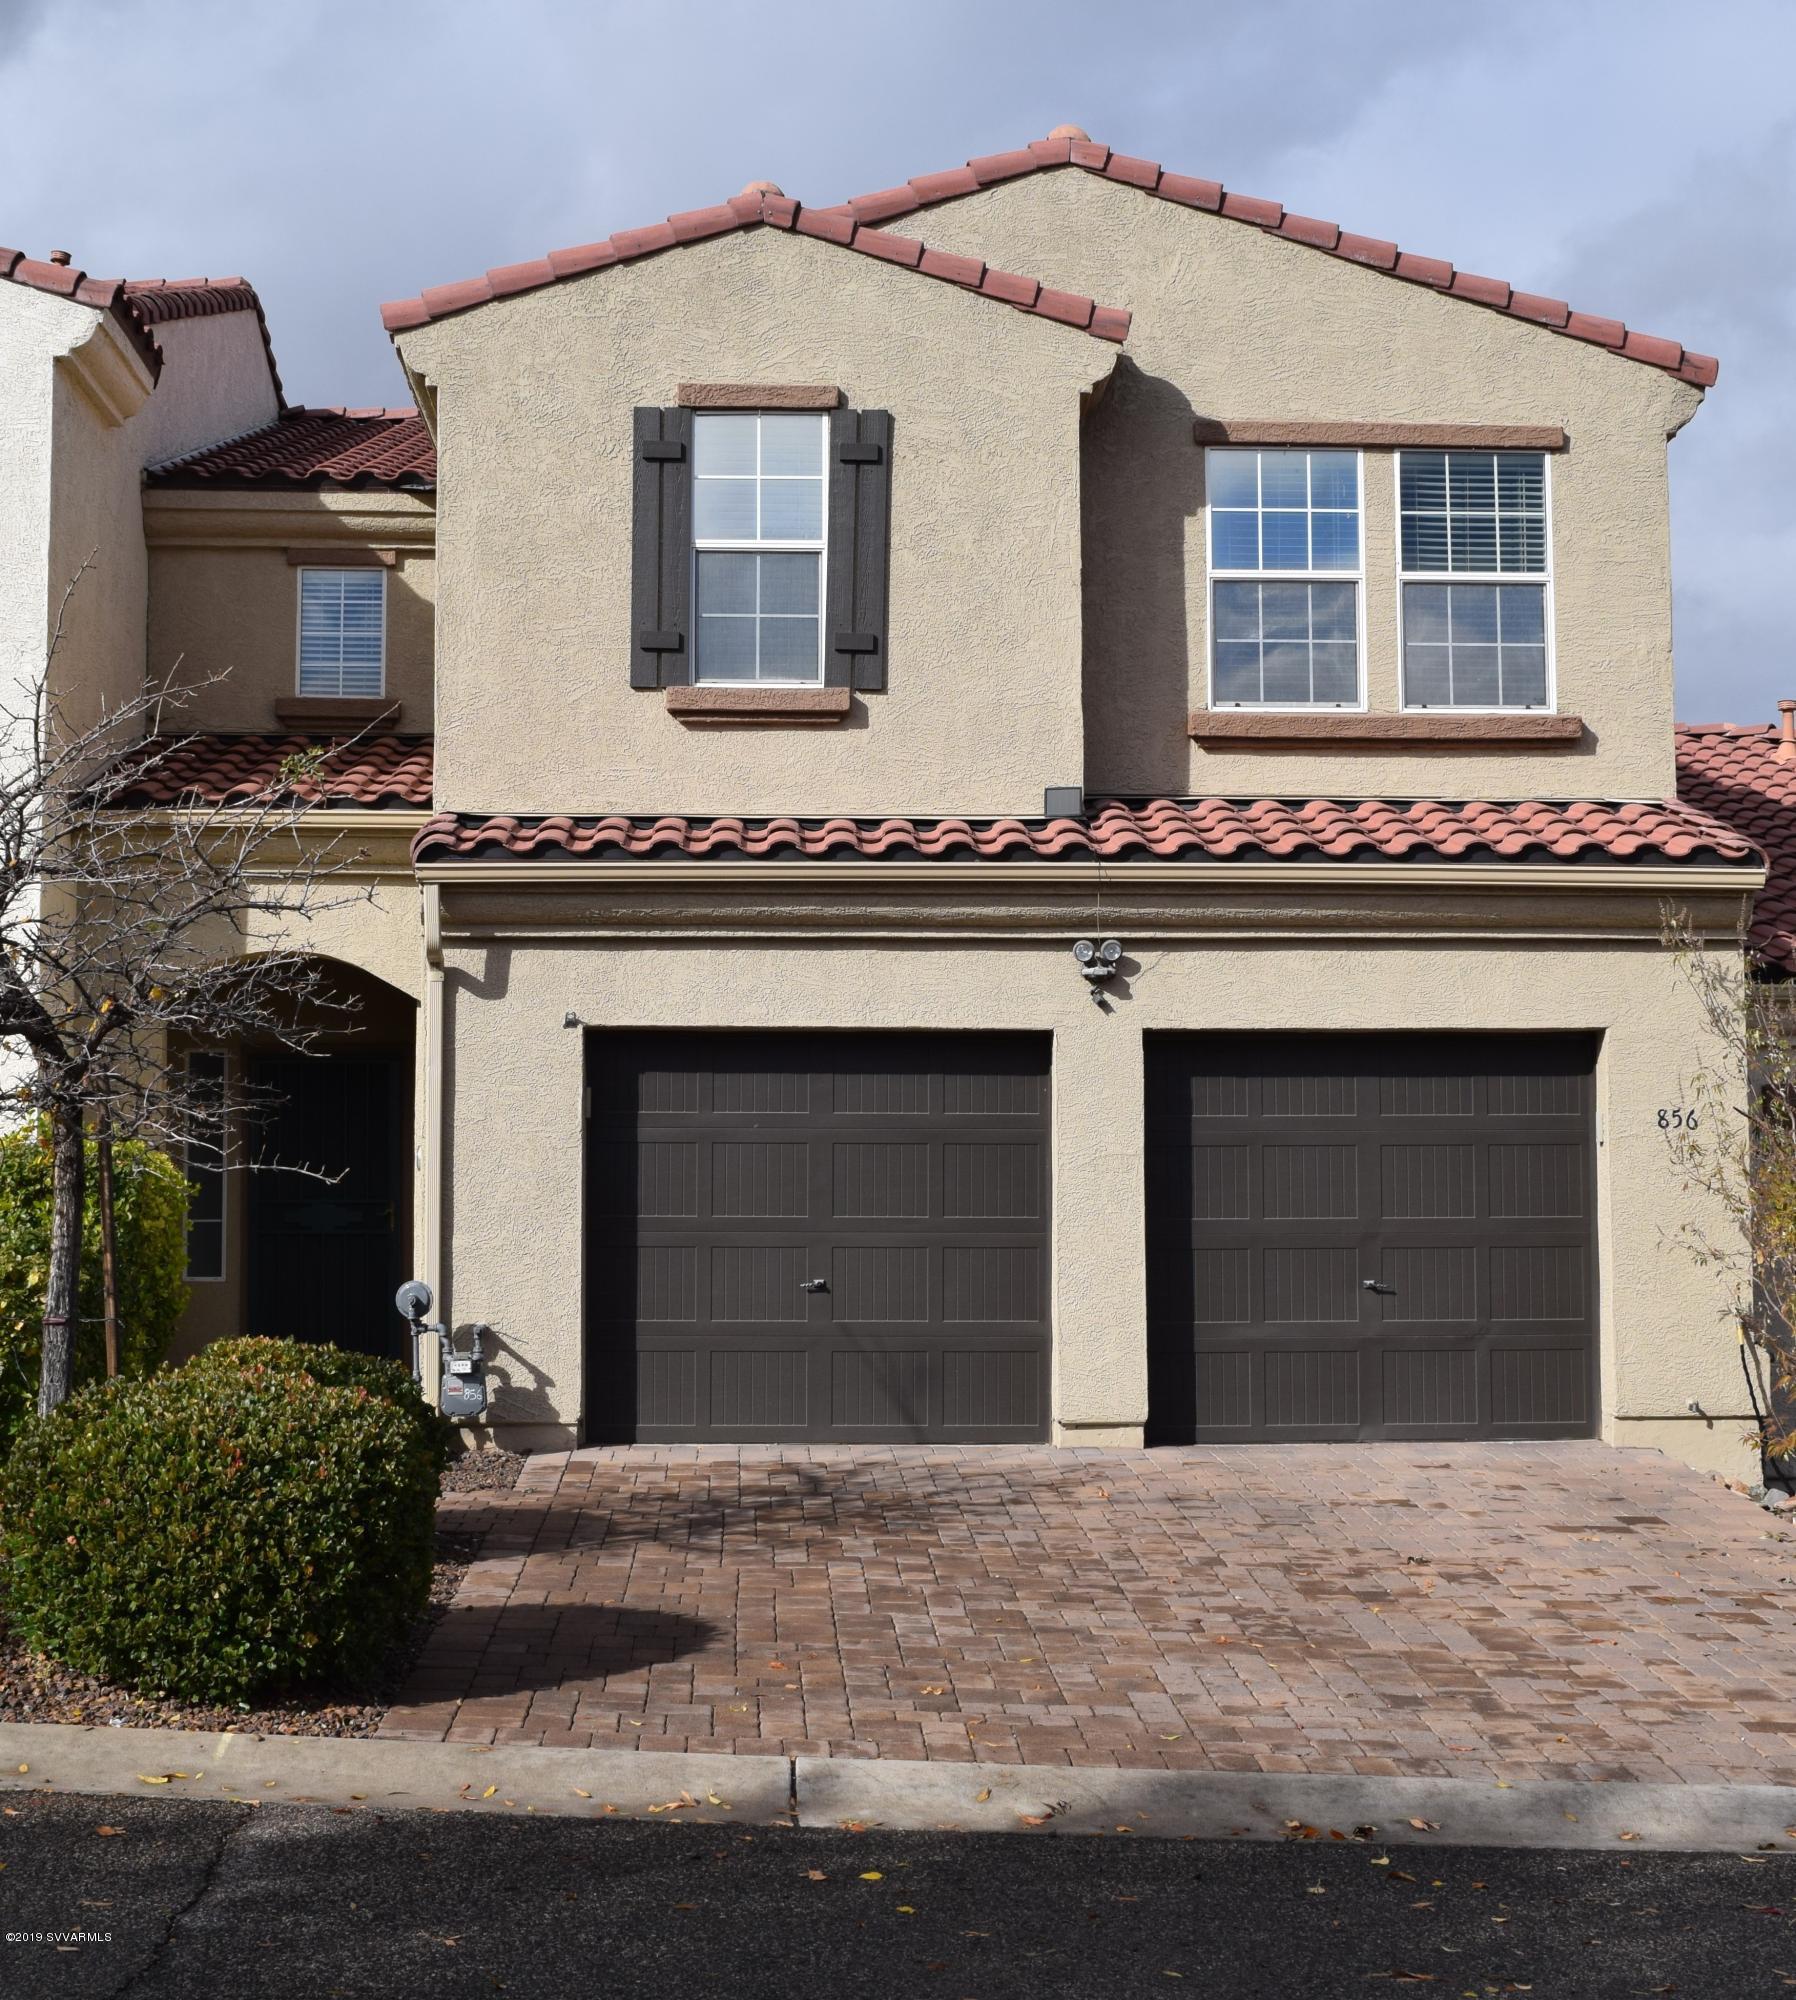 856 Tiablanca Rd Clarkdale, AZ 86324